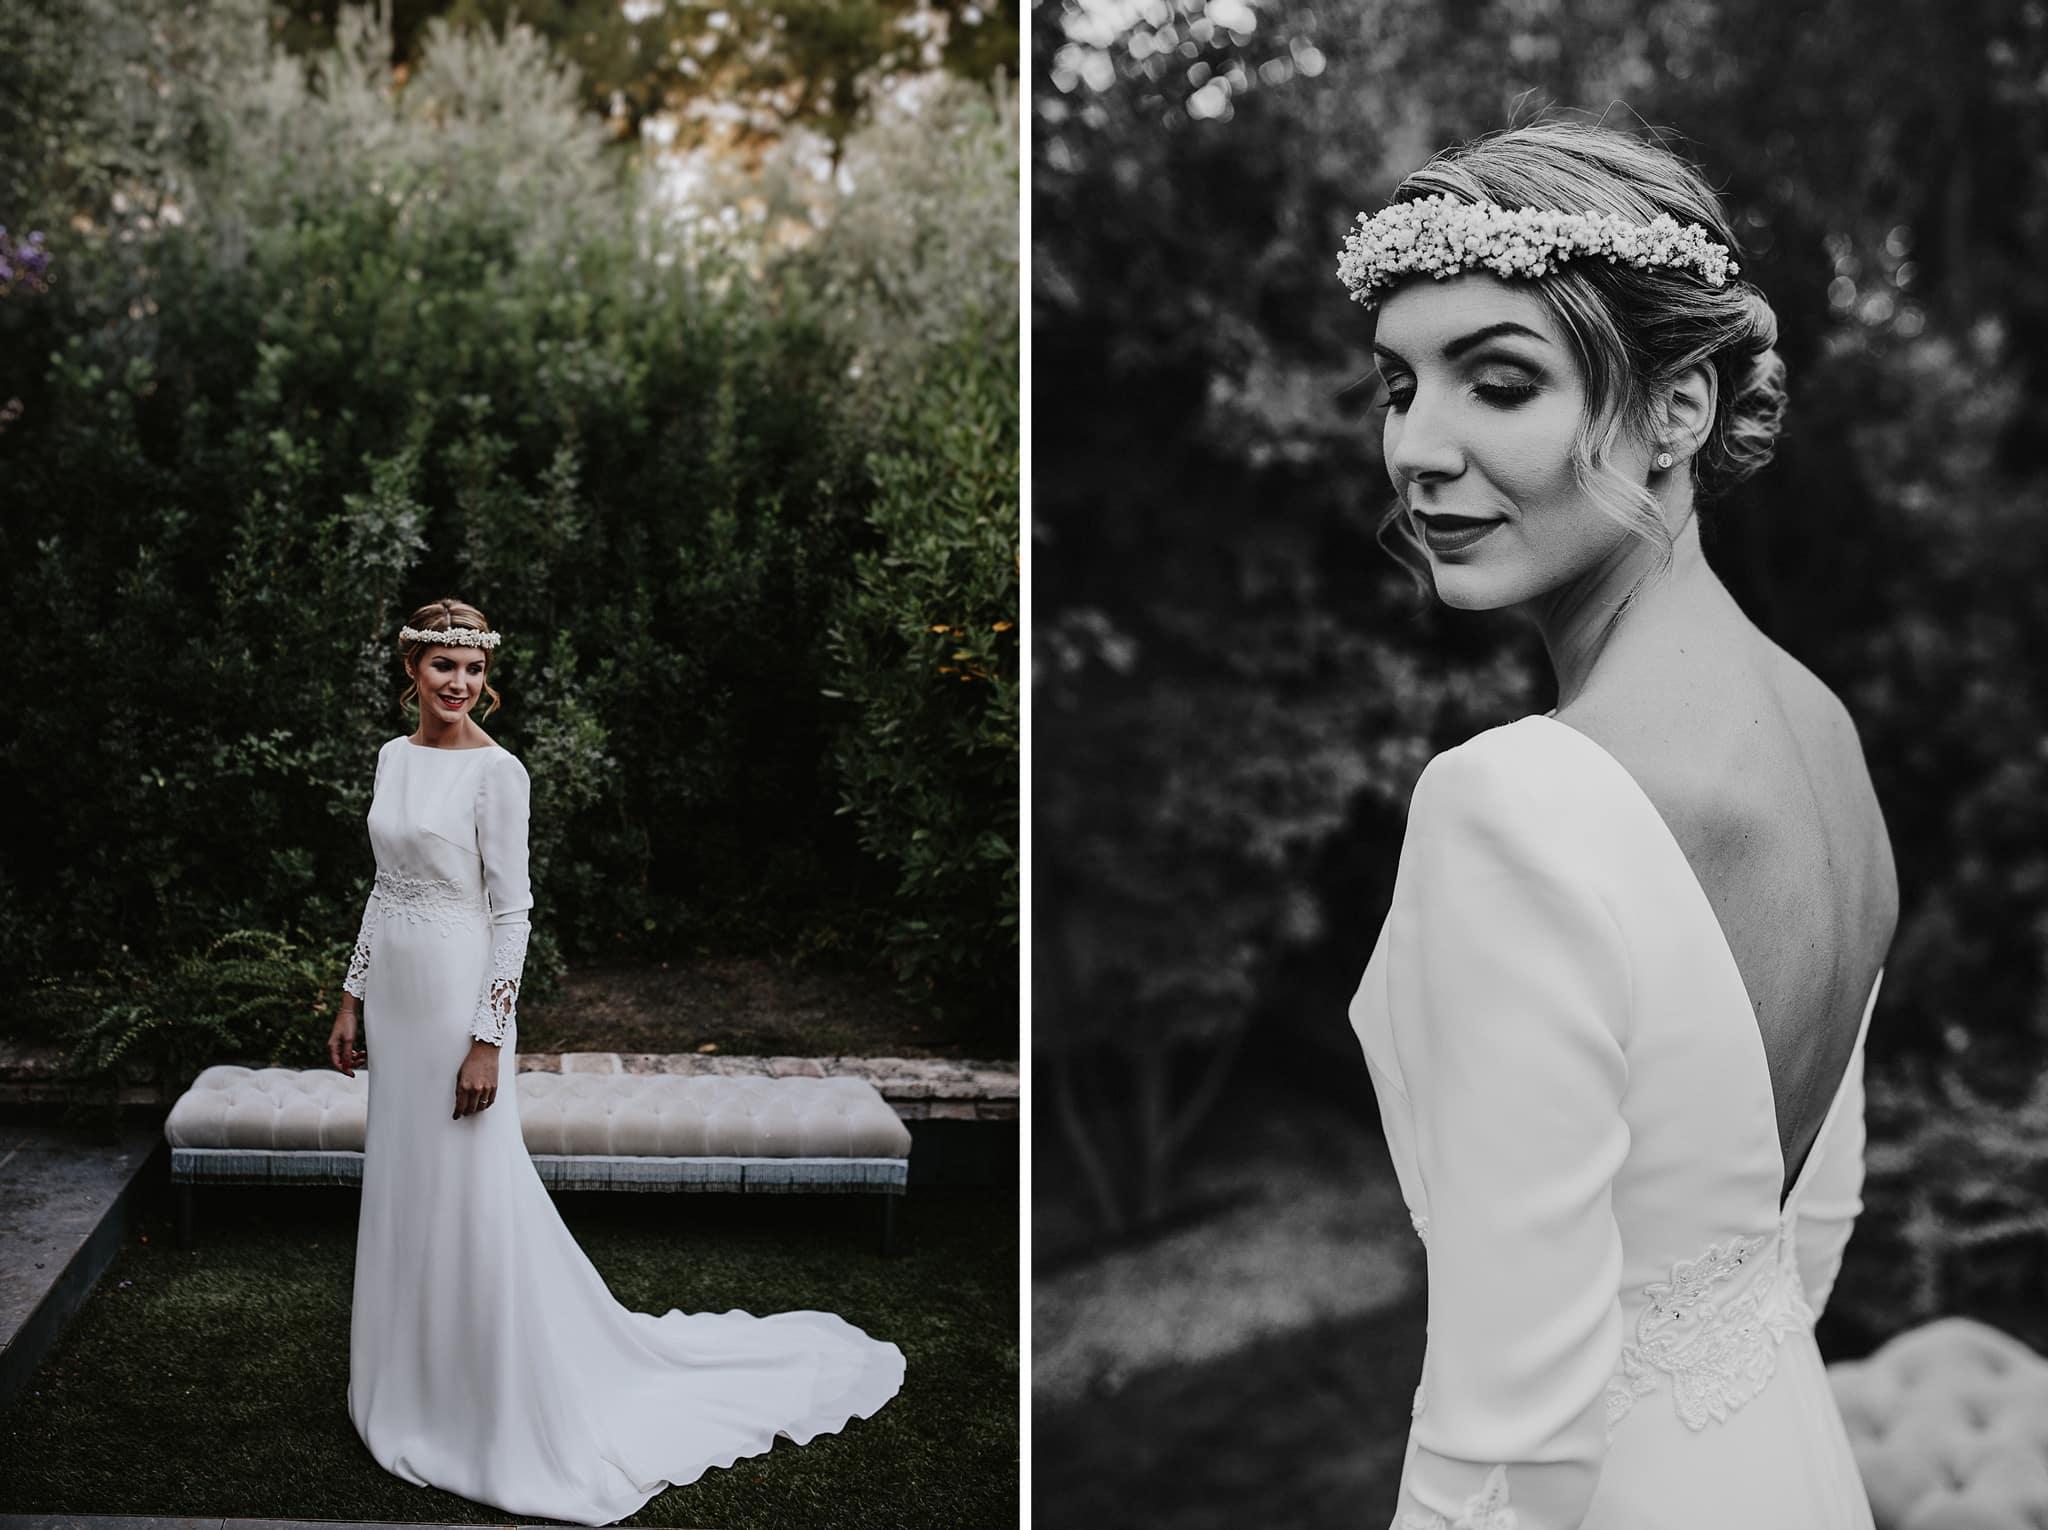 prisma-blanco-fotografos-bodas-toledo-51